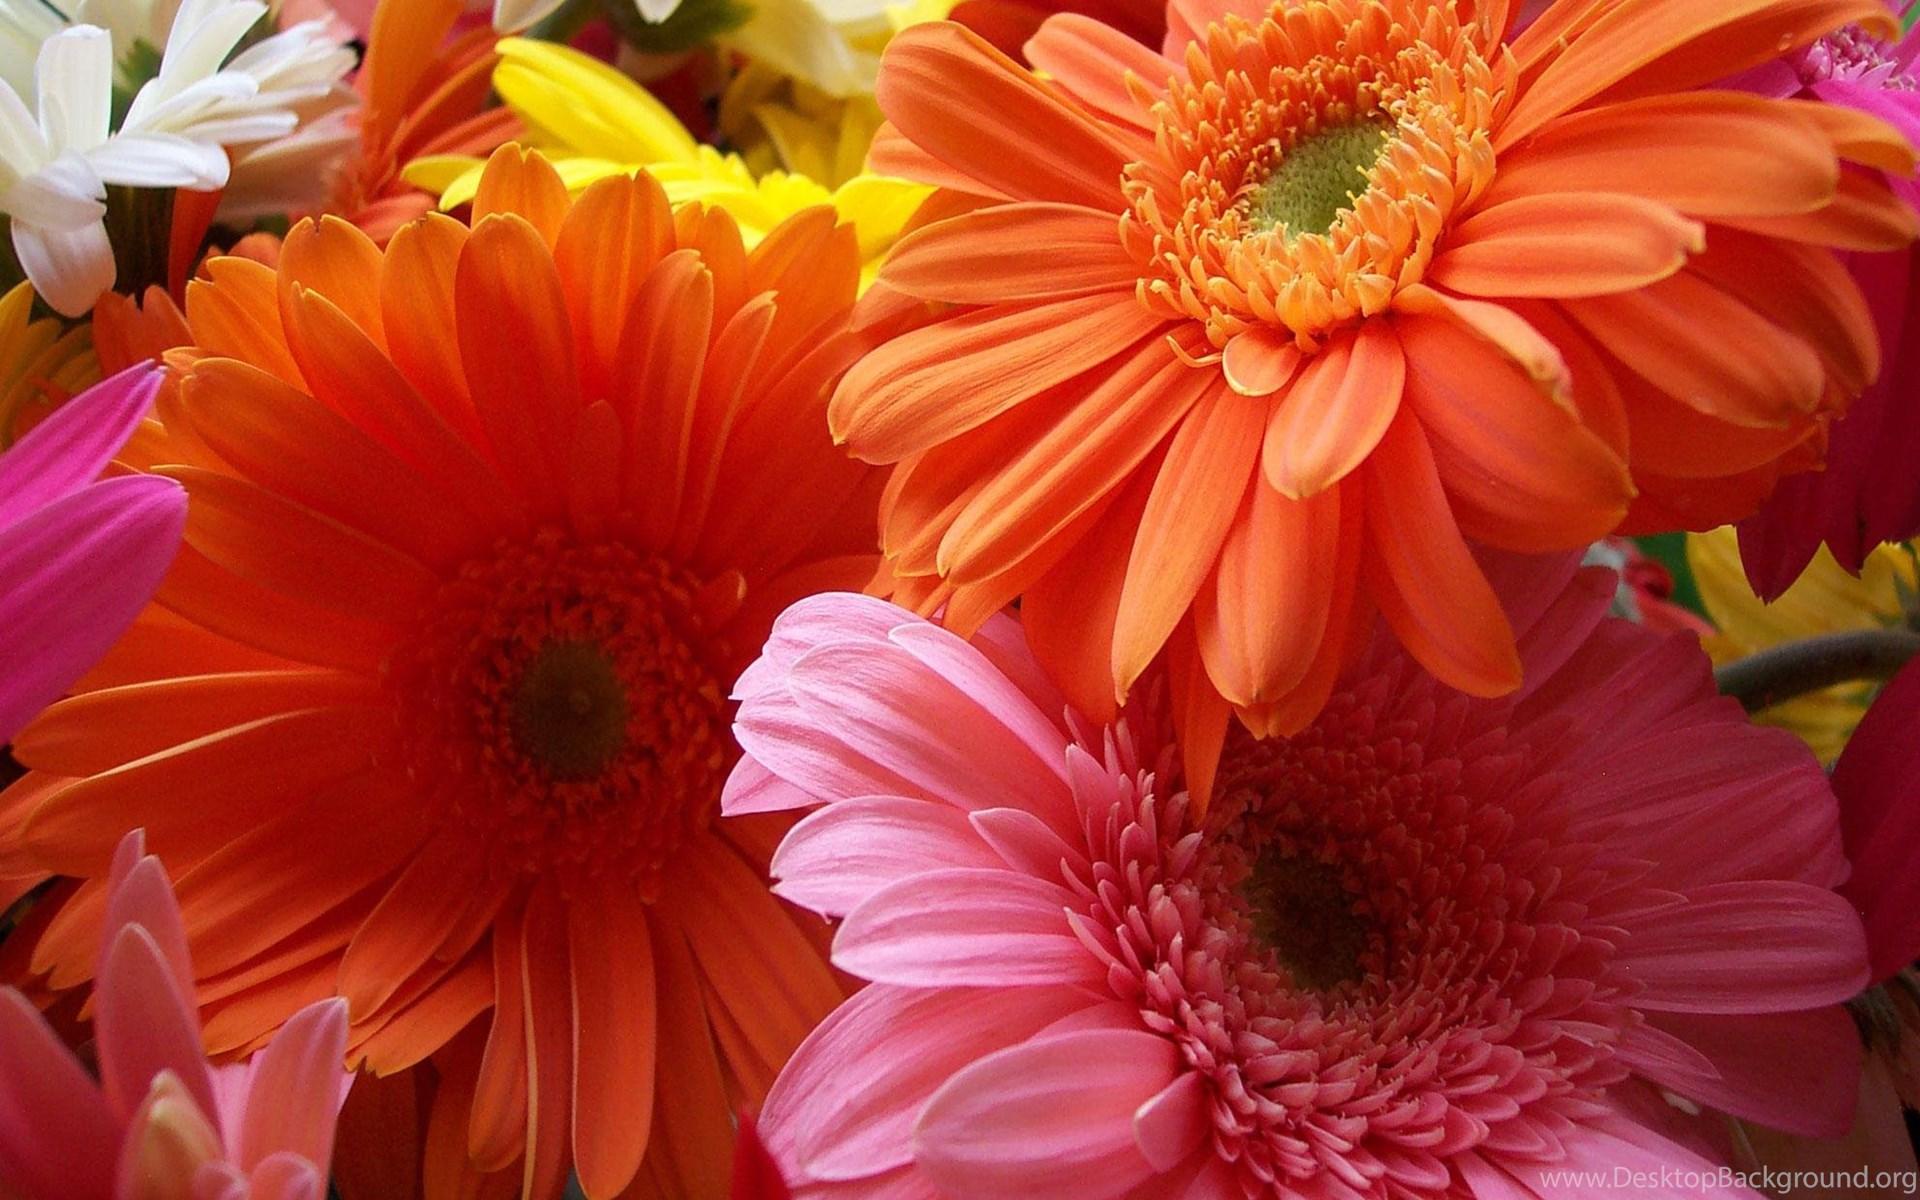 Top Colorful Gerbera Daisy Wallpaper Images For Pinterest Desktop